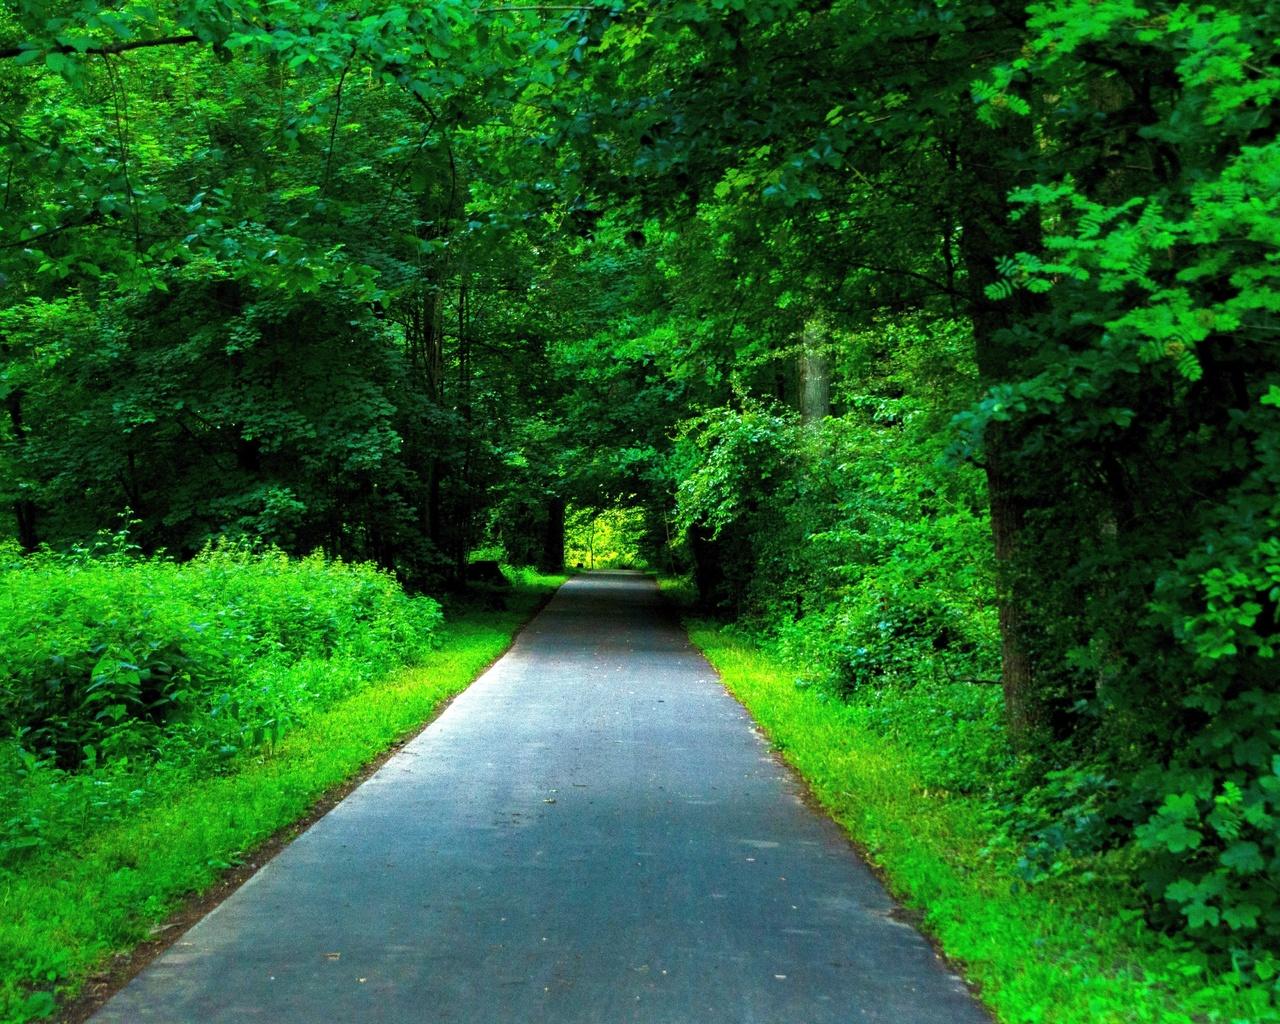 парк, дорожка, тень, лето